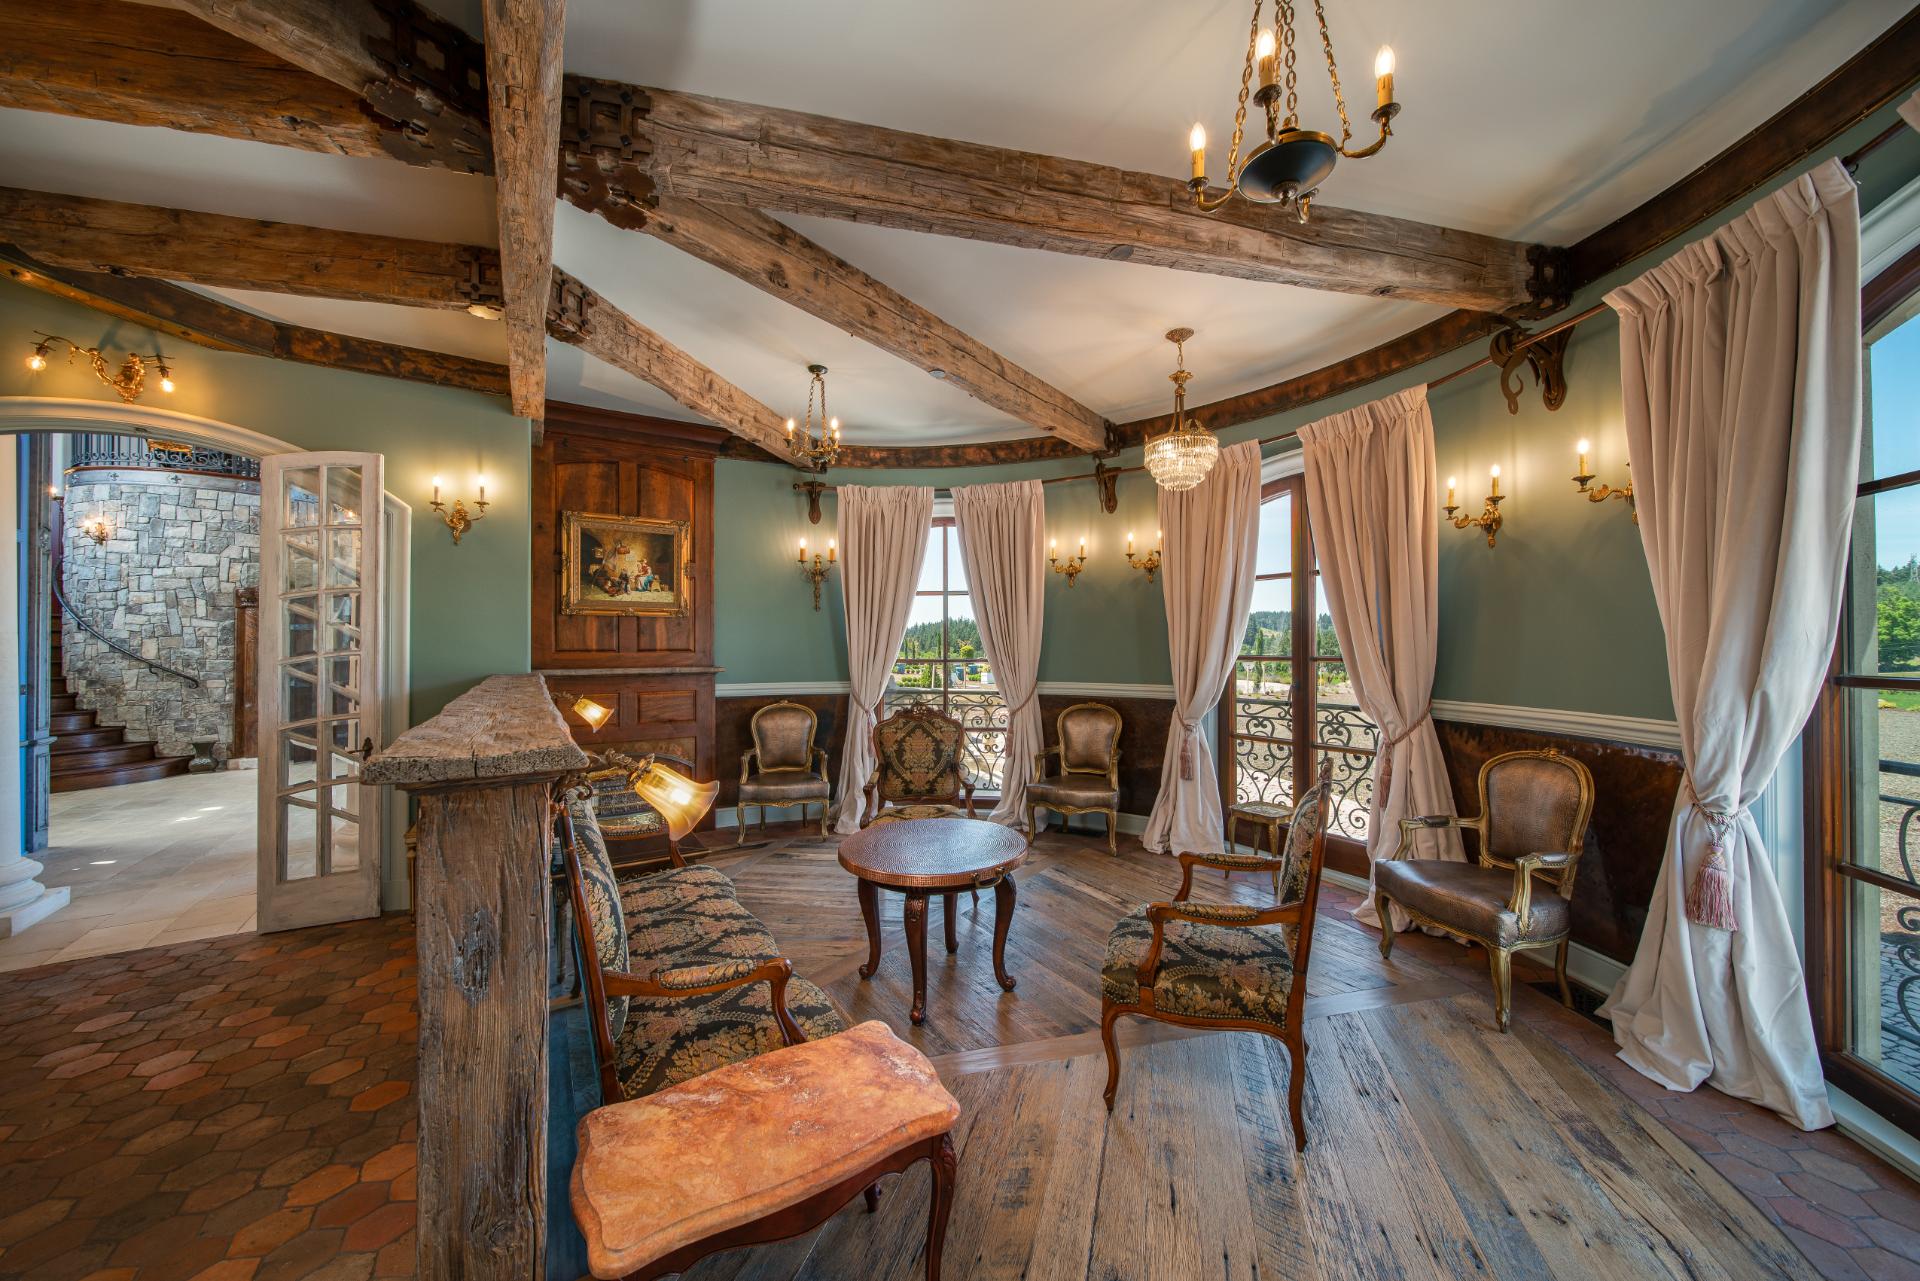 castle woodworking finish carpentry robert havas